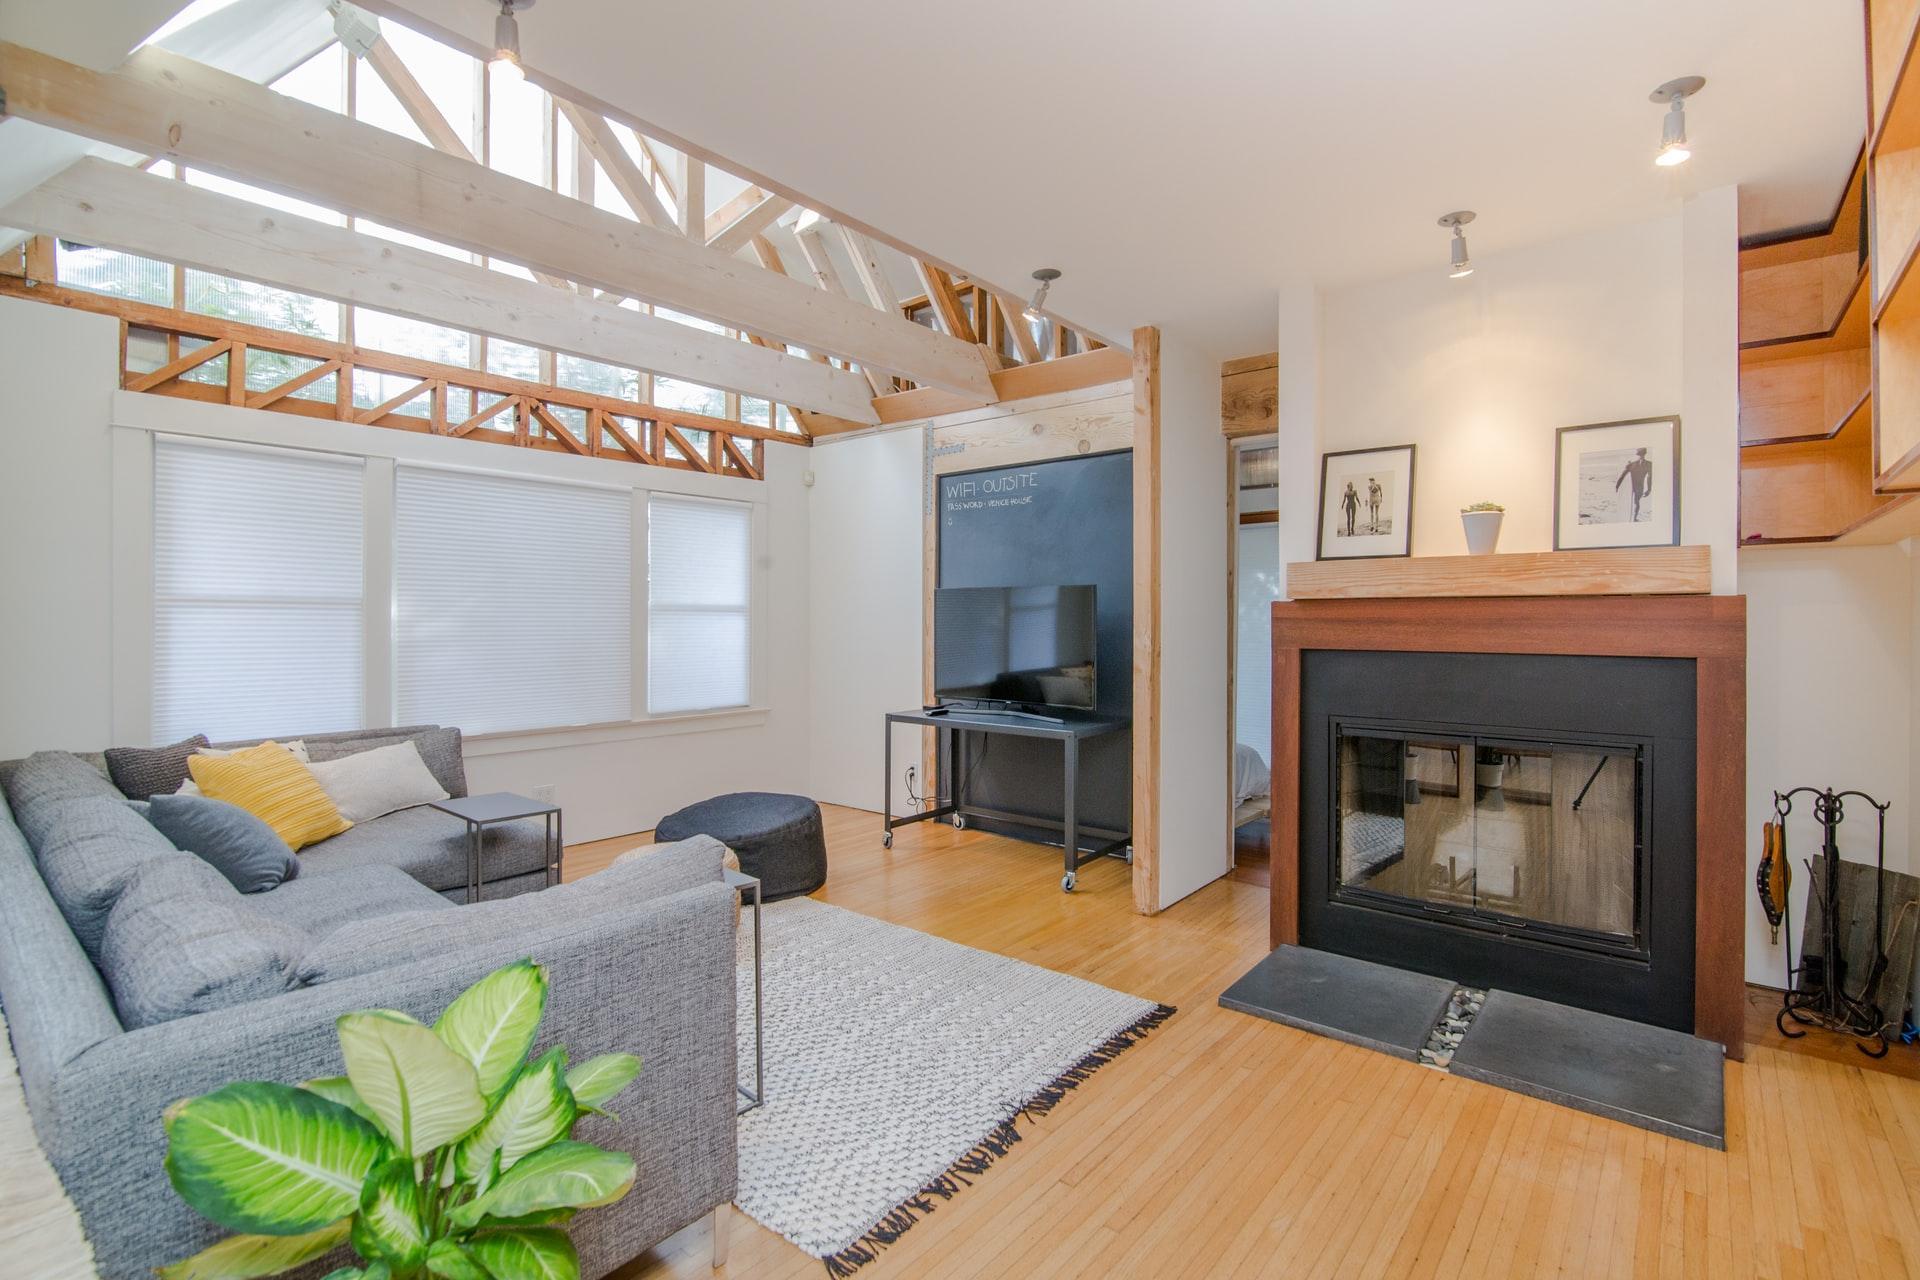 furnished-living-room-with-HK-furniture